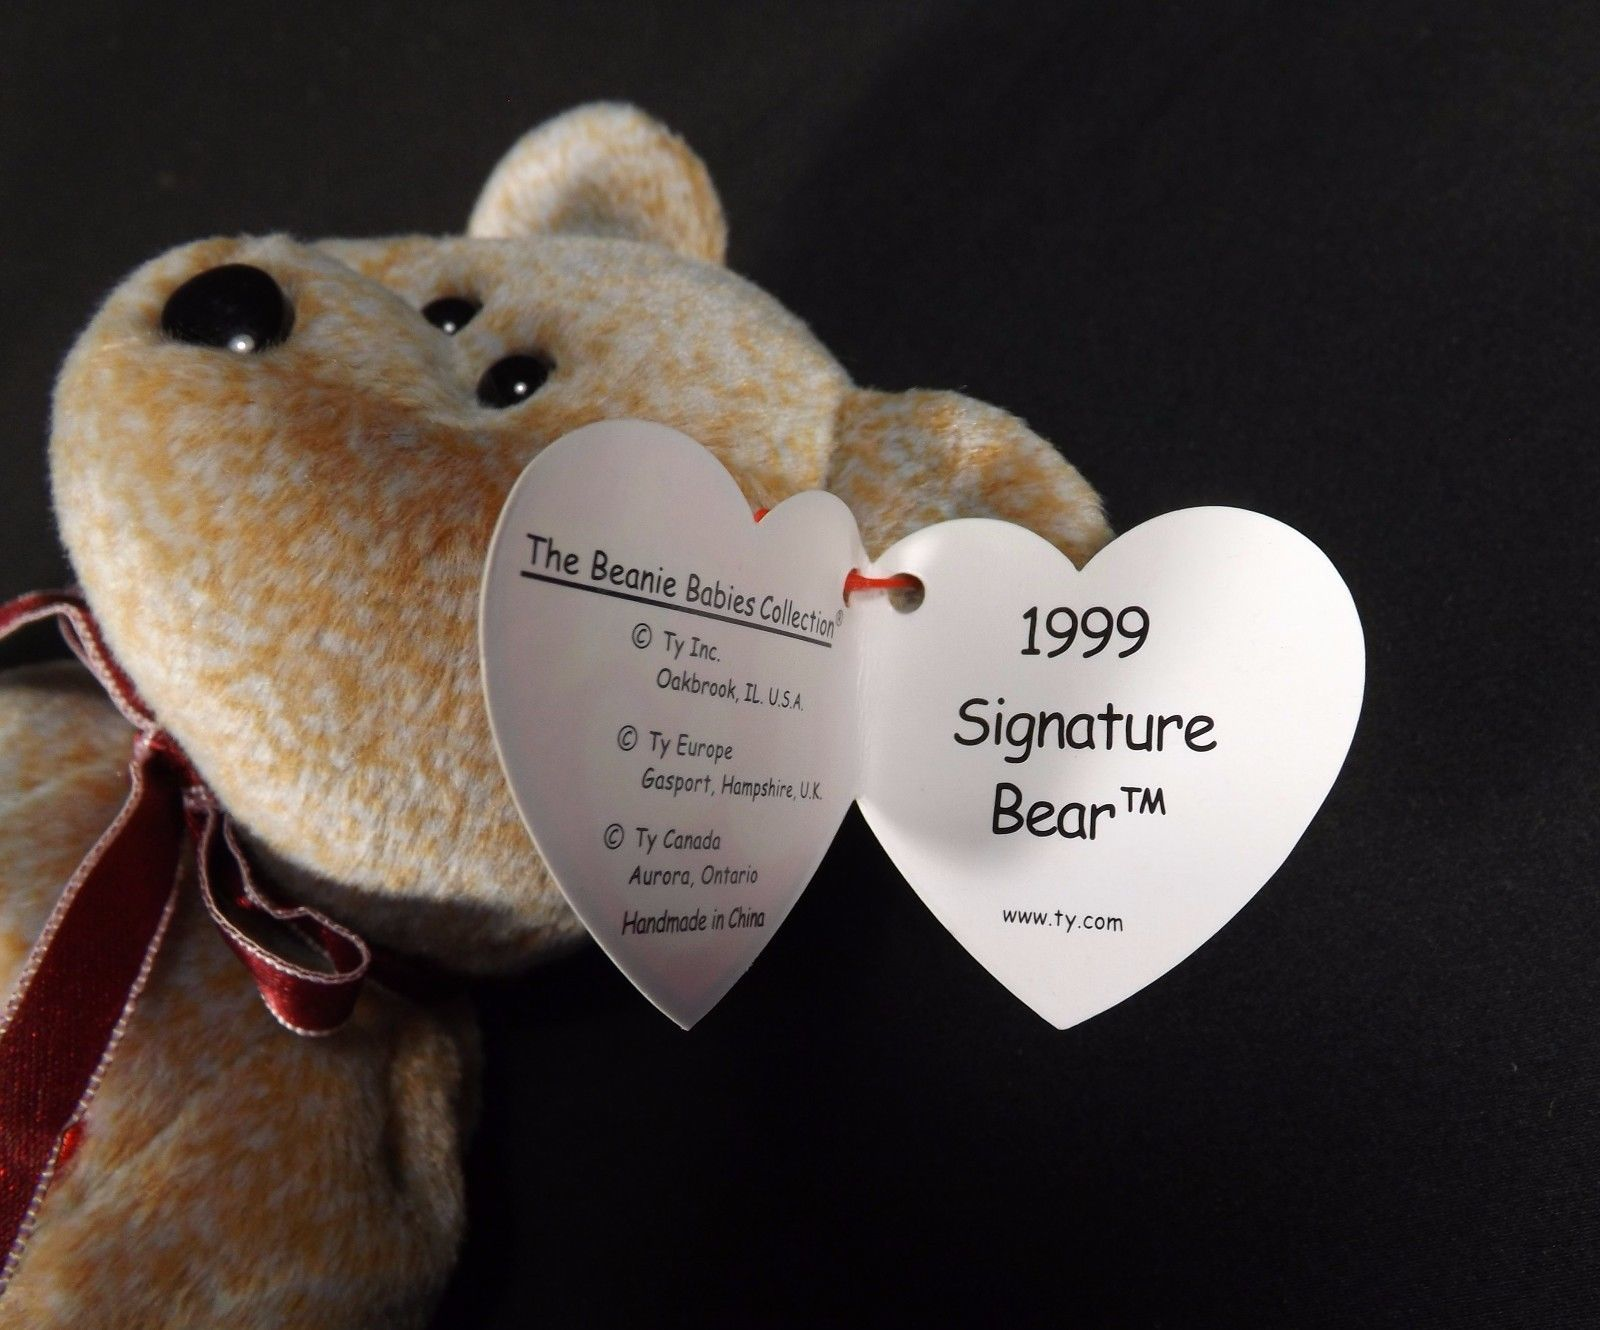 1ab93c22d98 1999 Signature Bear 4TH Generation Error and 15 similar items